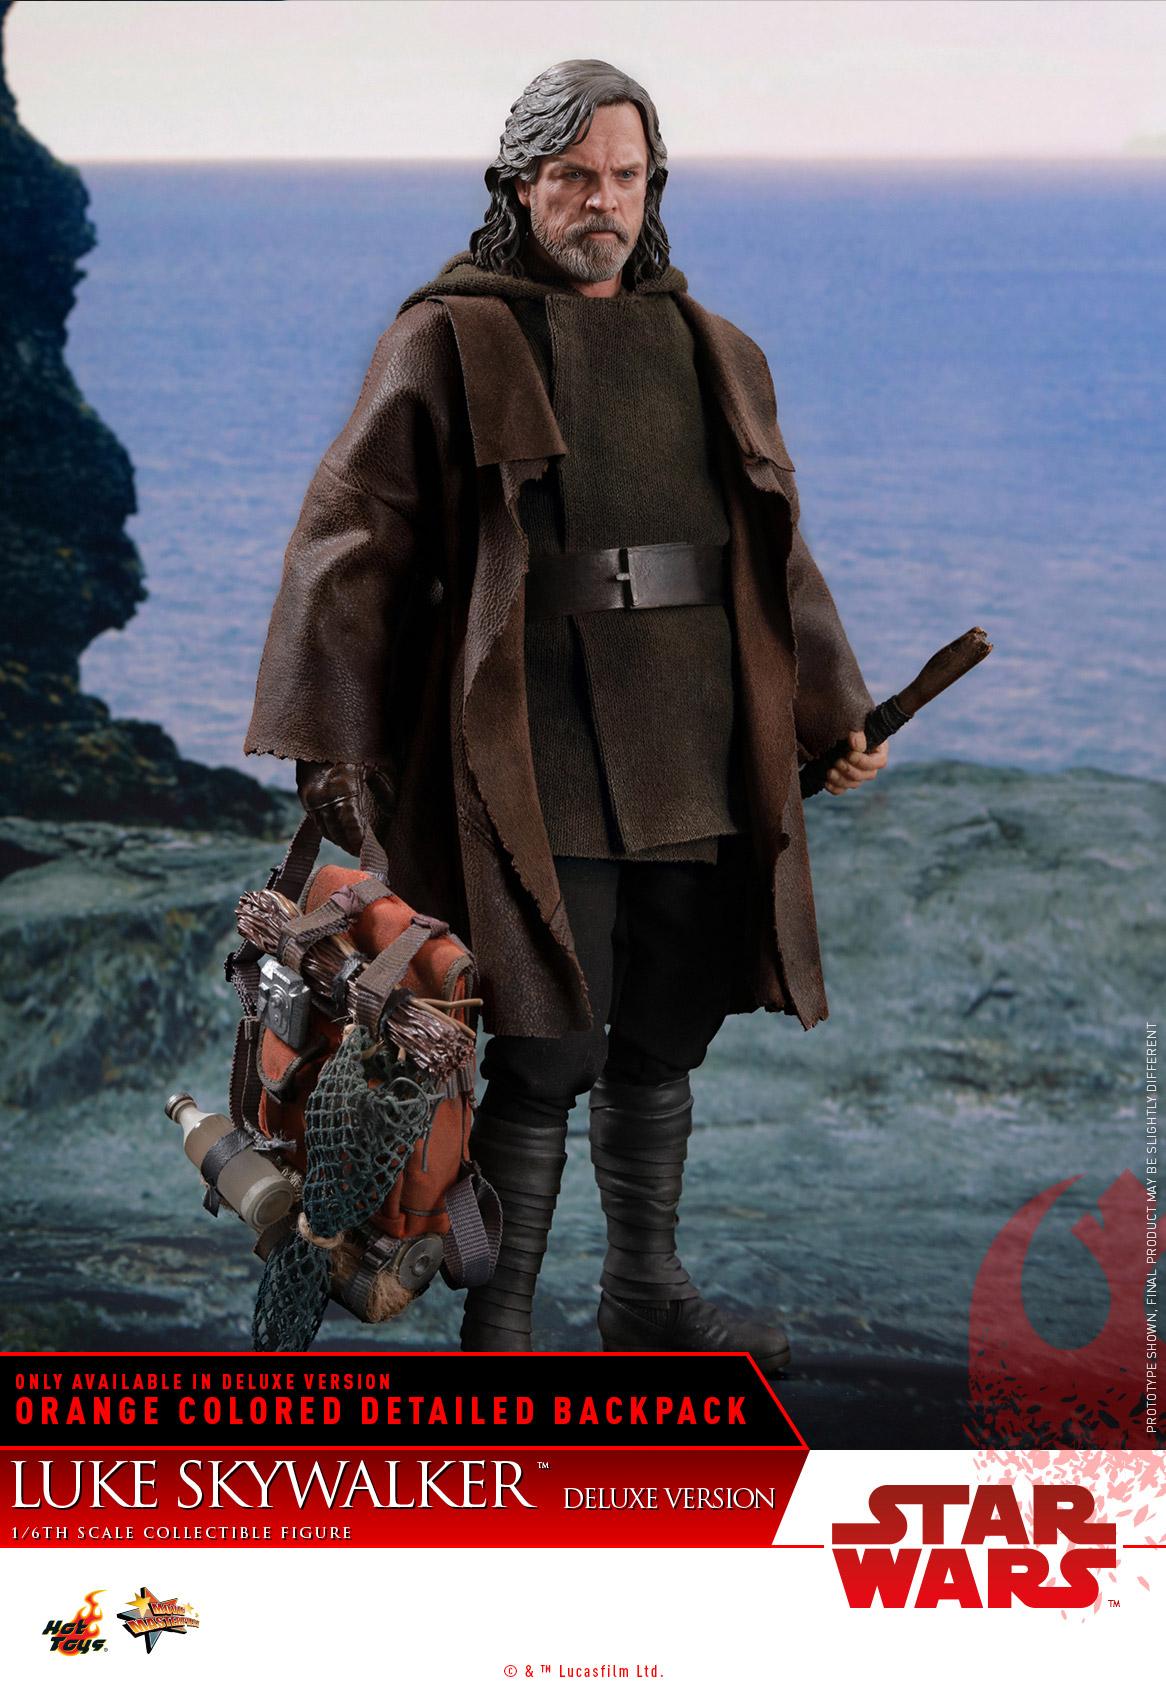 Hot-Toys---Star-Wars---Luke-Skywalker-collectible-figure-(Deluxe)_PR1